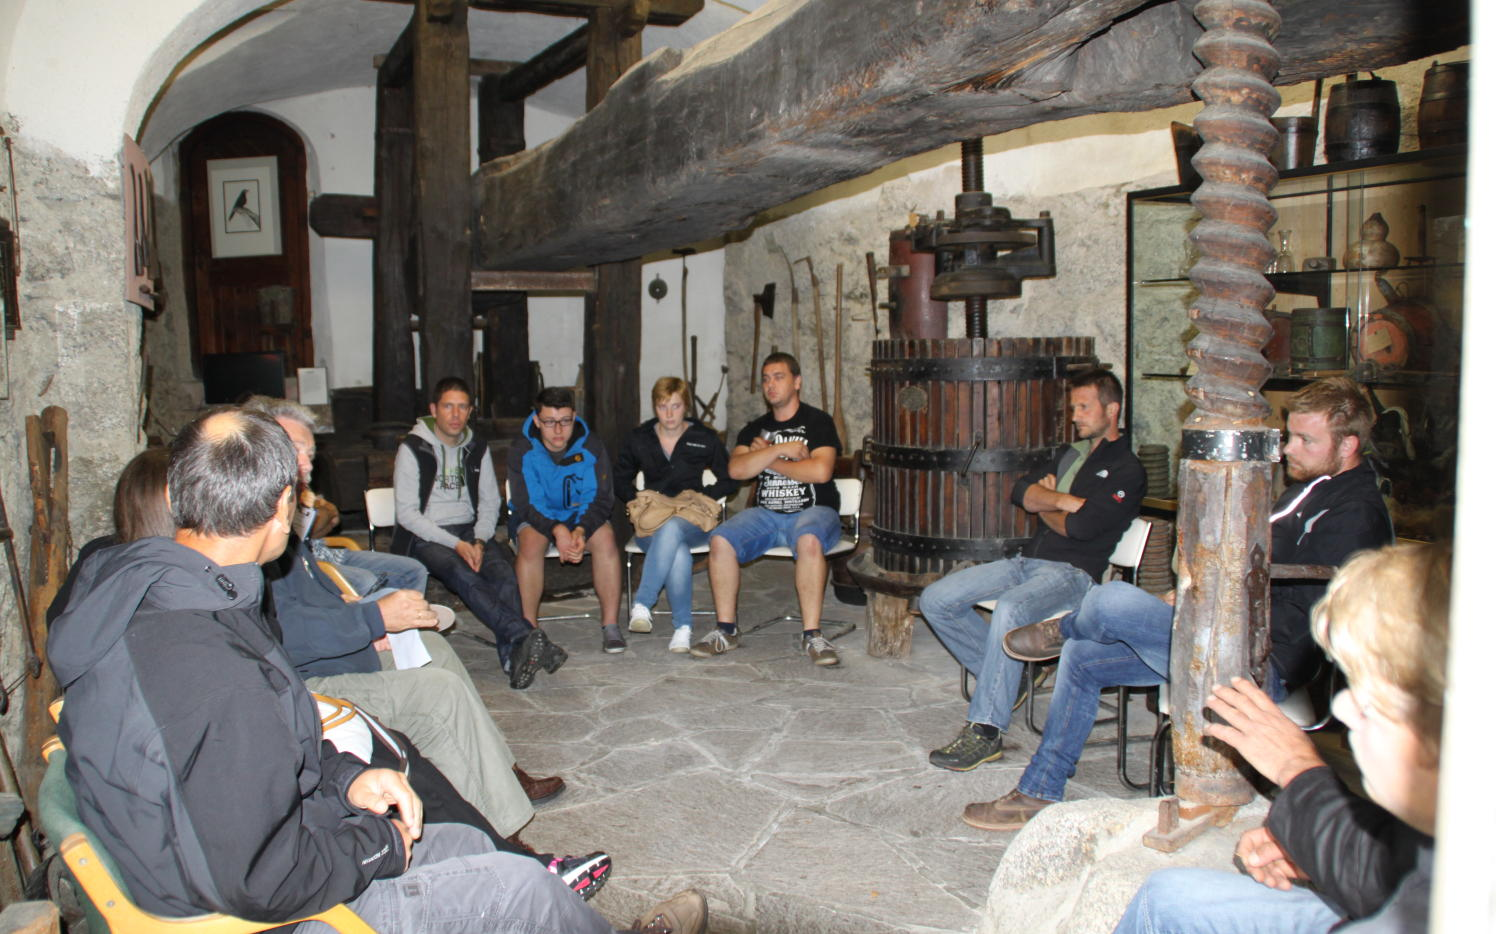 2014_Brunnenburg Dorf Tirol Bezirk_Bezirksklausur Offen Gredt 5